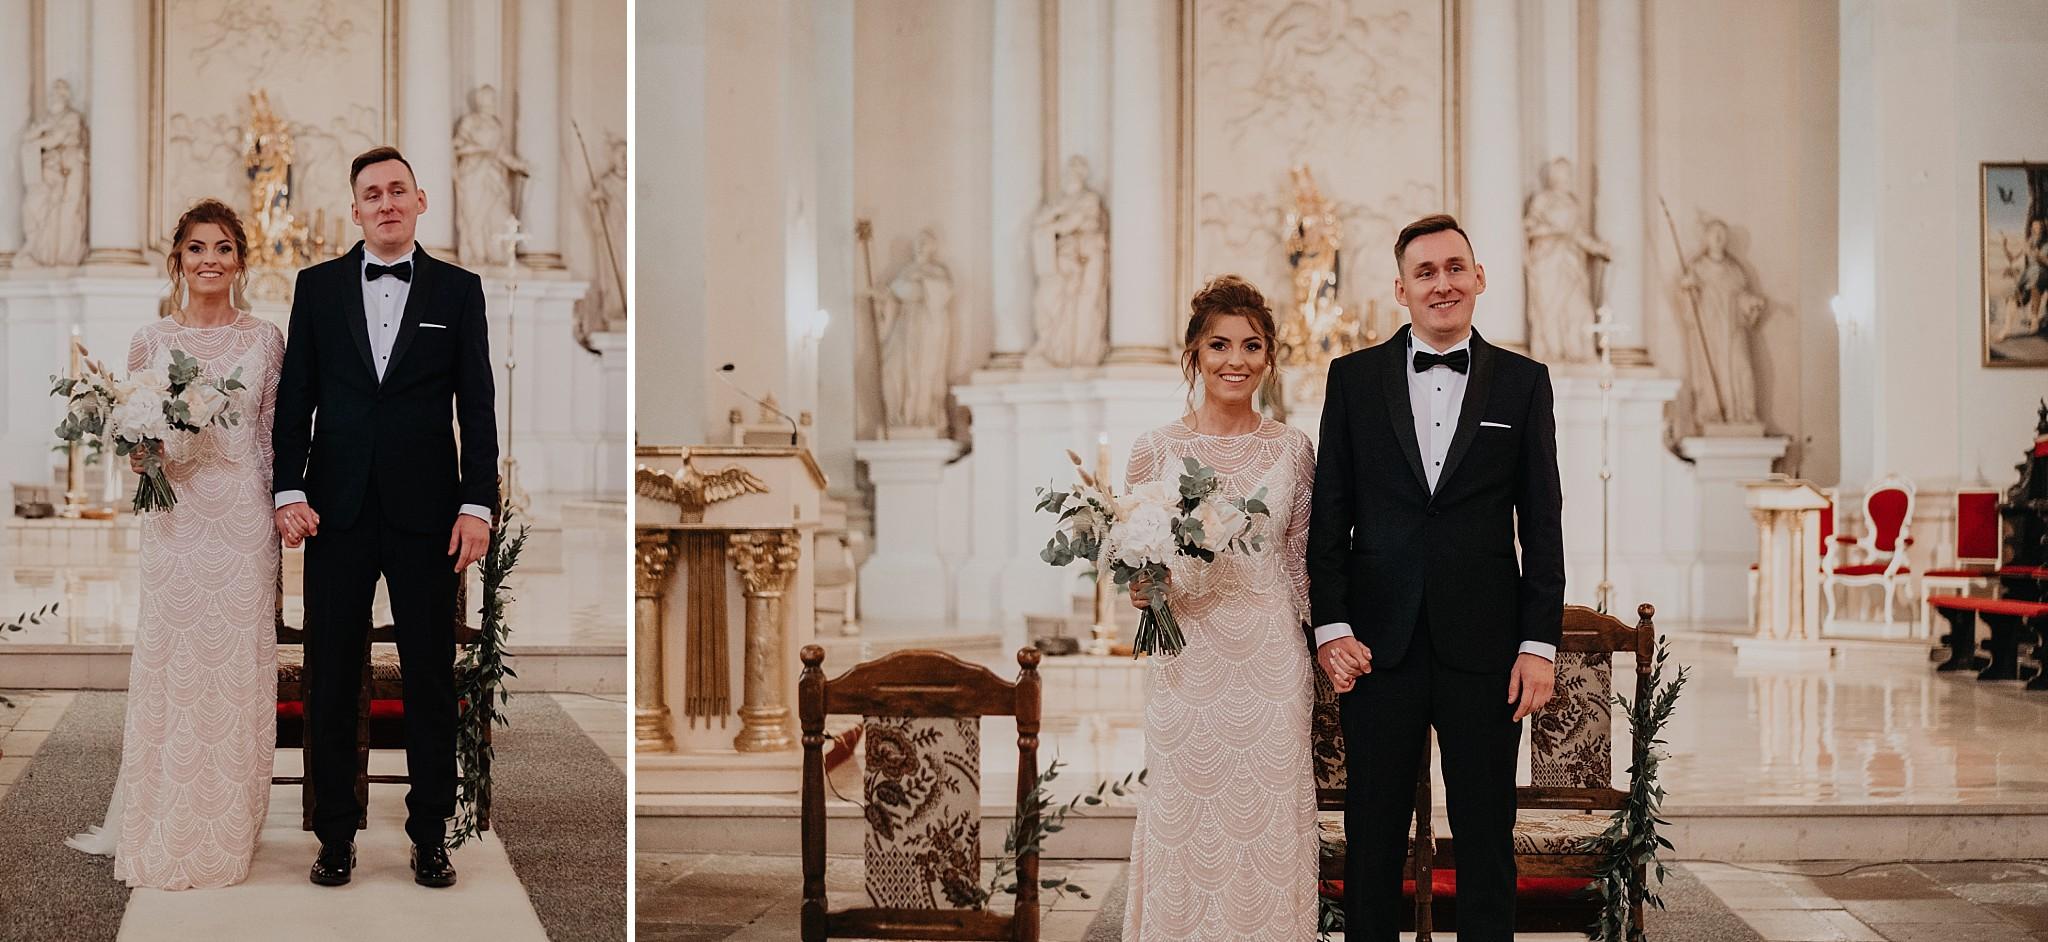 fotograf poznan wesele dobra truskawka piekne wesele pod poznaniem wesele w dobrej truskawce piekna para mloda slub marzen slub koronawirus slub listopad wesele koronawirus 208